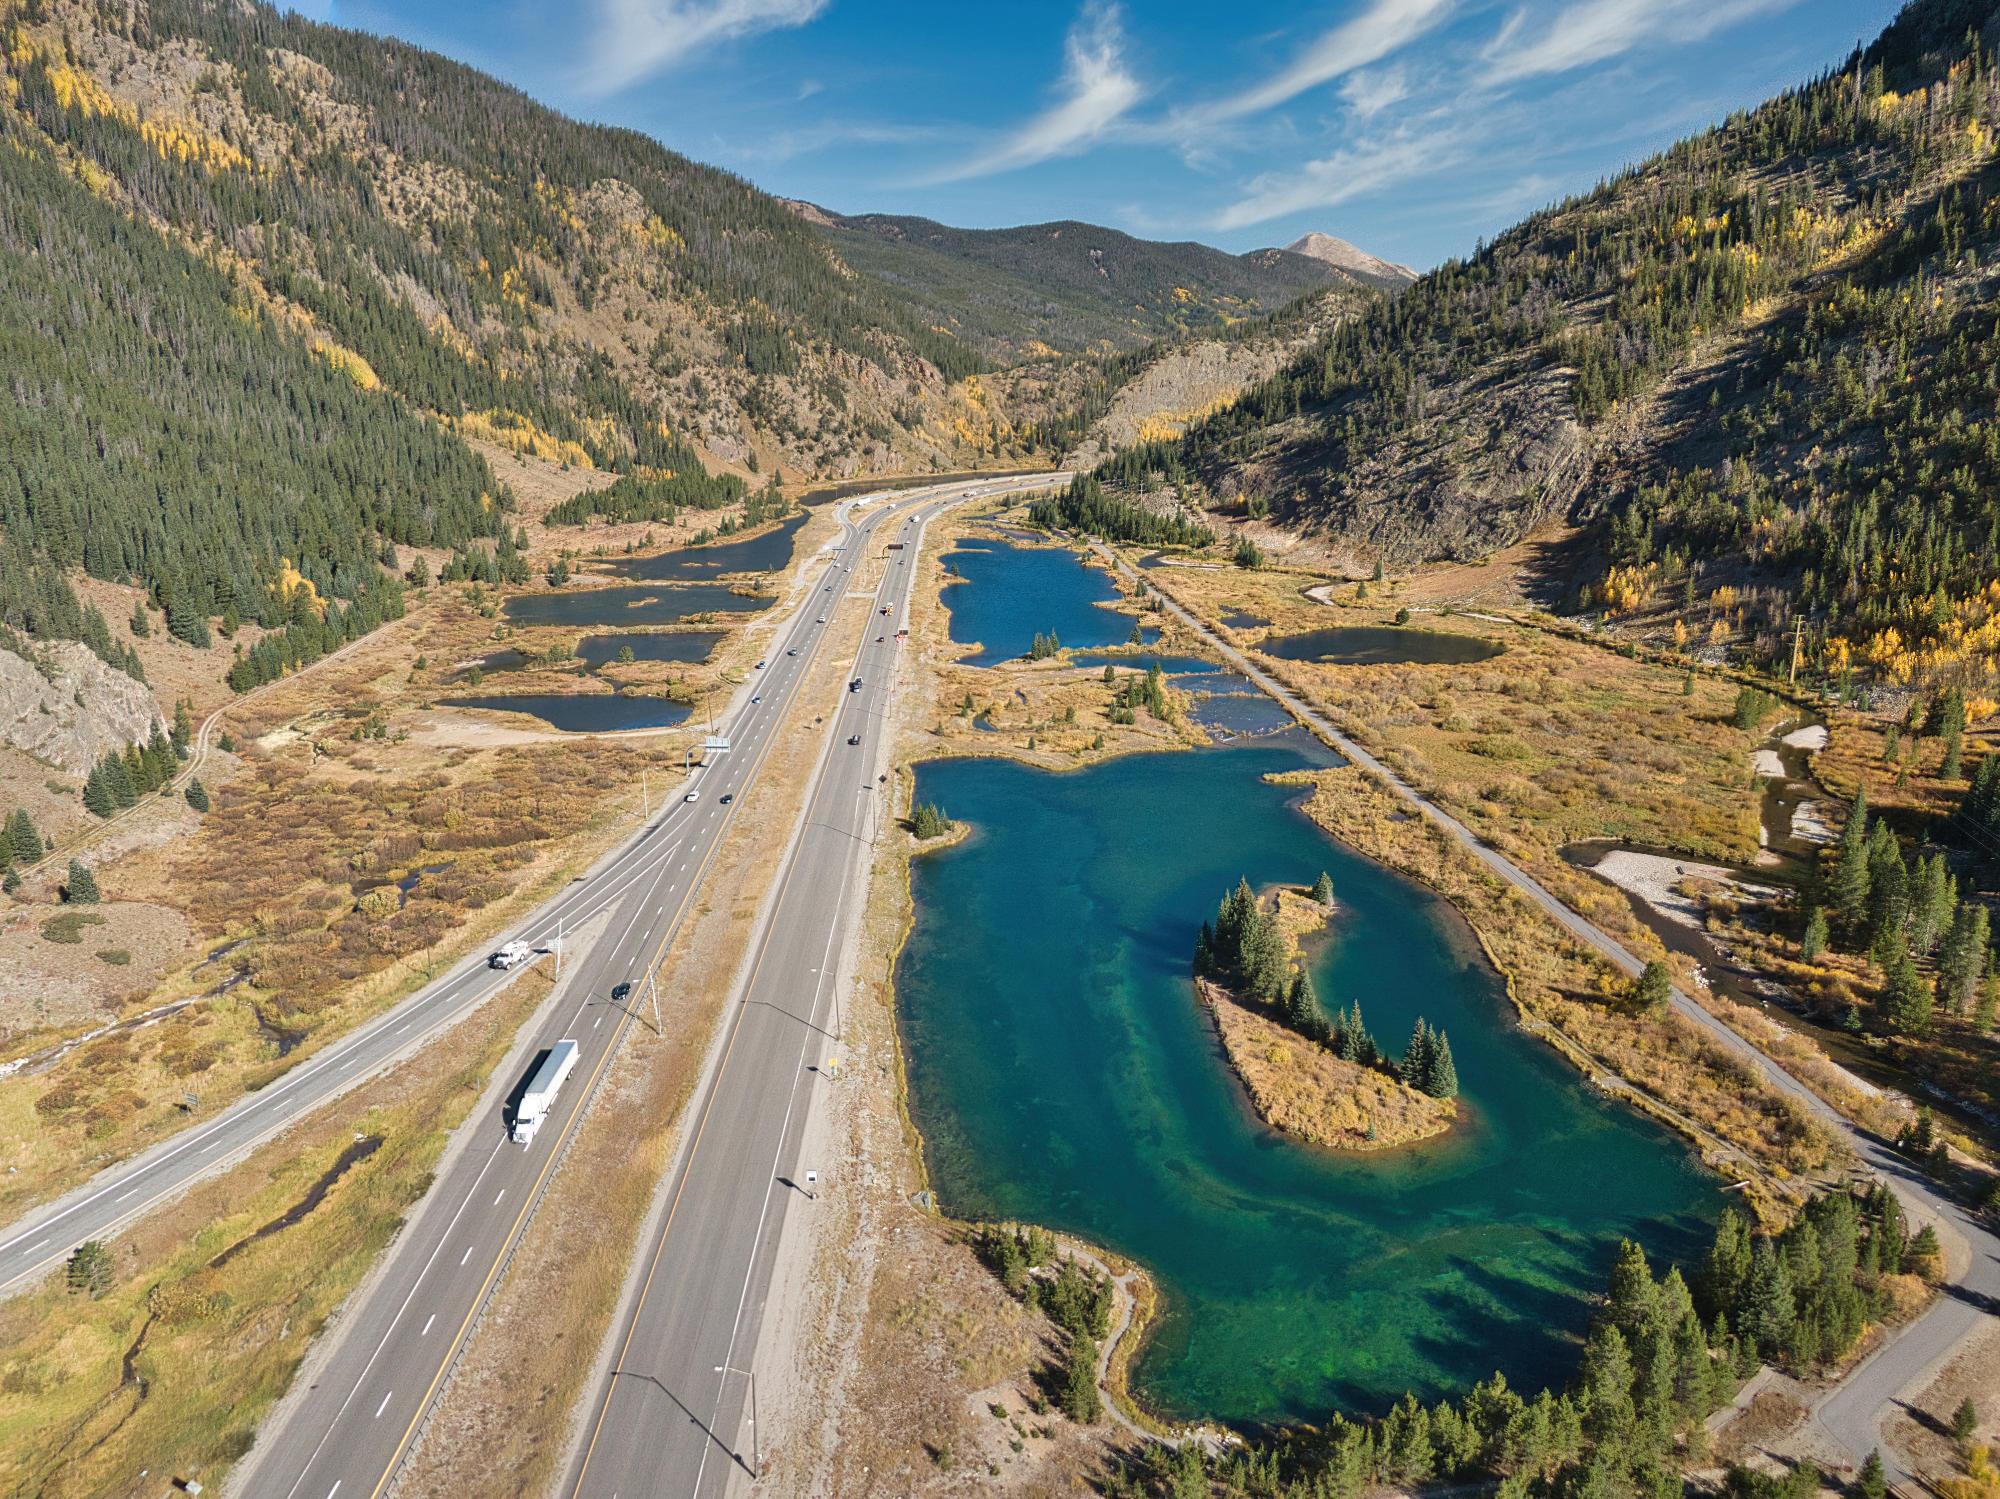 Interstate 70 Westbound in Western Colorado, United States.